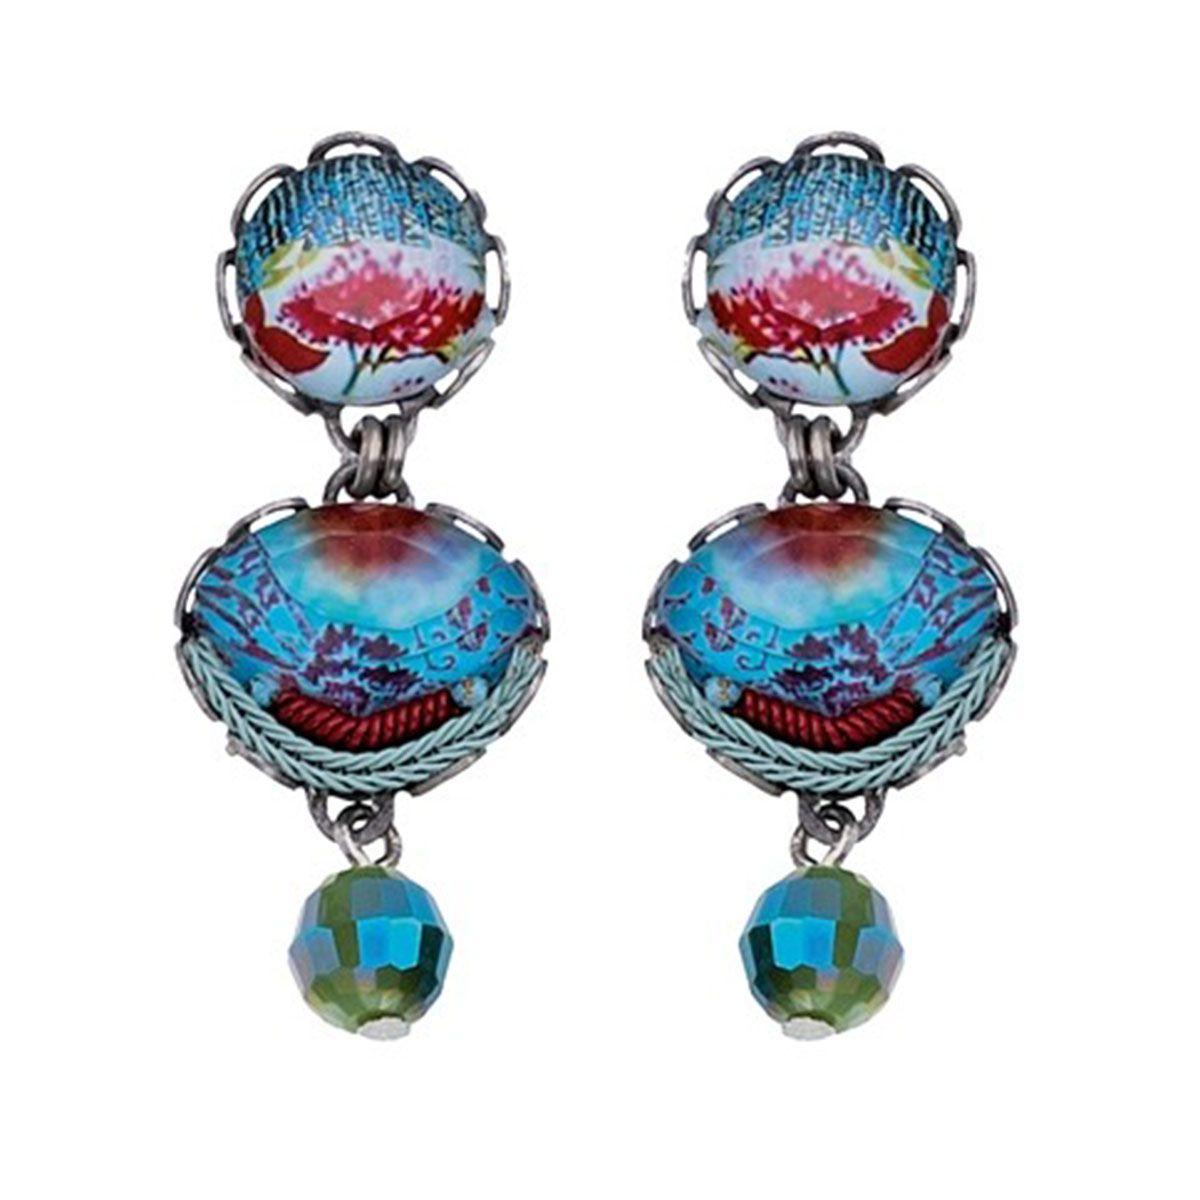 Ayala Bar Israeli Jewelry - Astral Light Olivia Post Earrings - Fall/Winter  2018